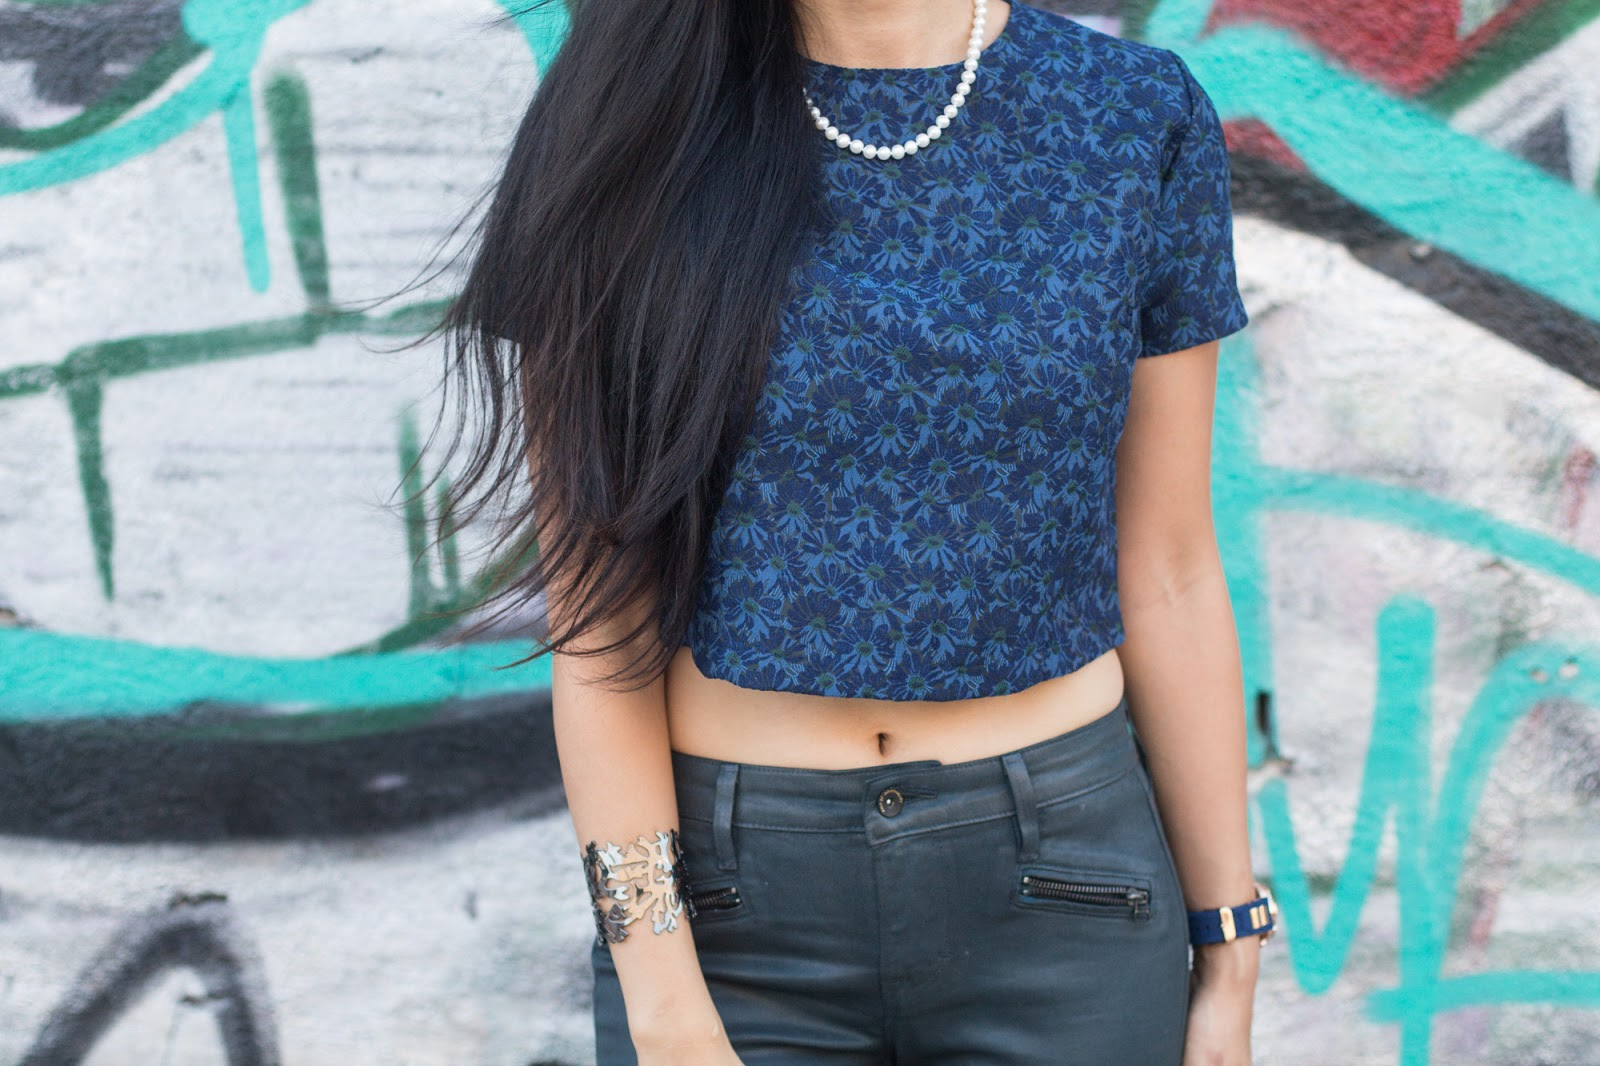 Jenny Wu LA style fashion blogger